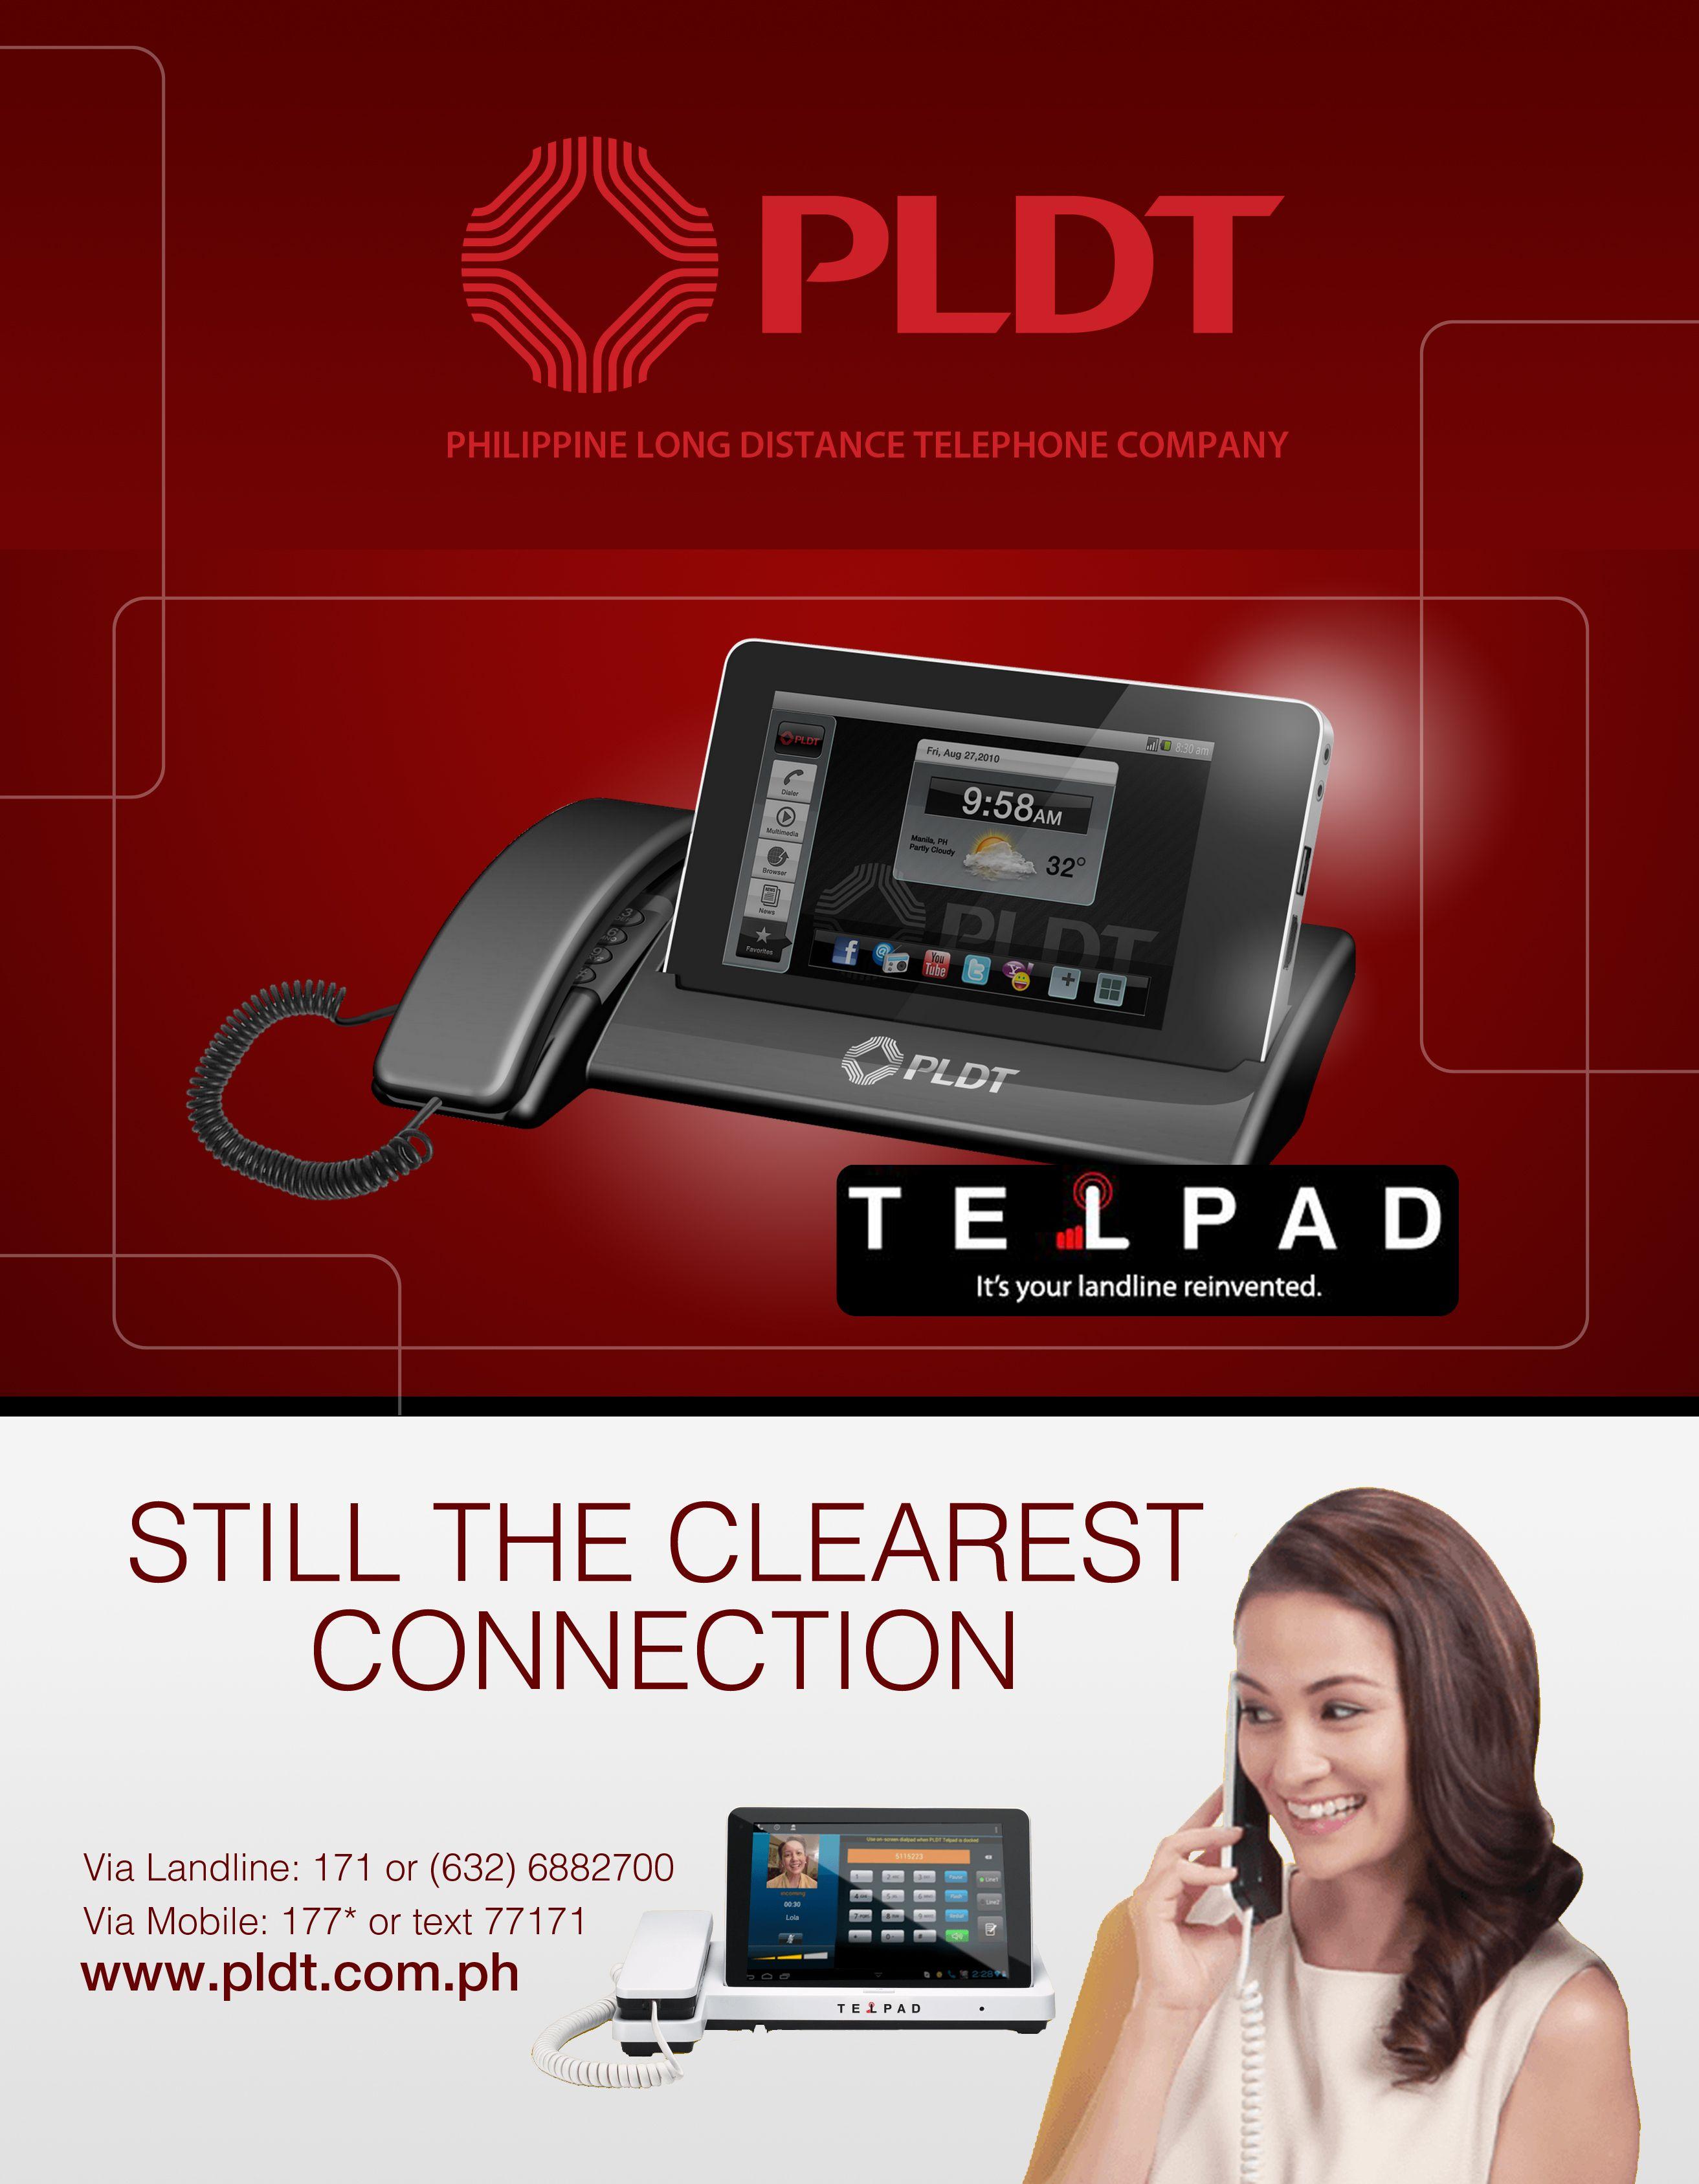 PLDT Ad | YCG Philippines | Philippines, Shopping